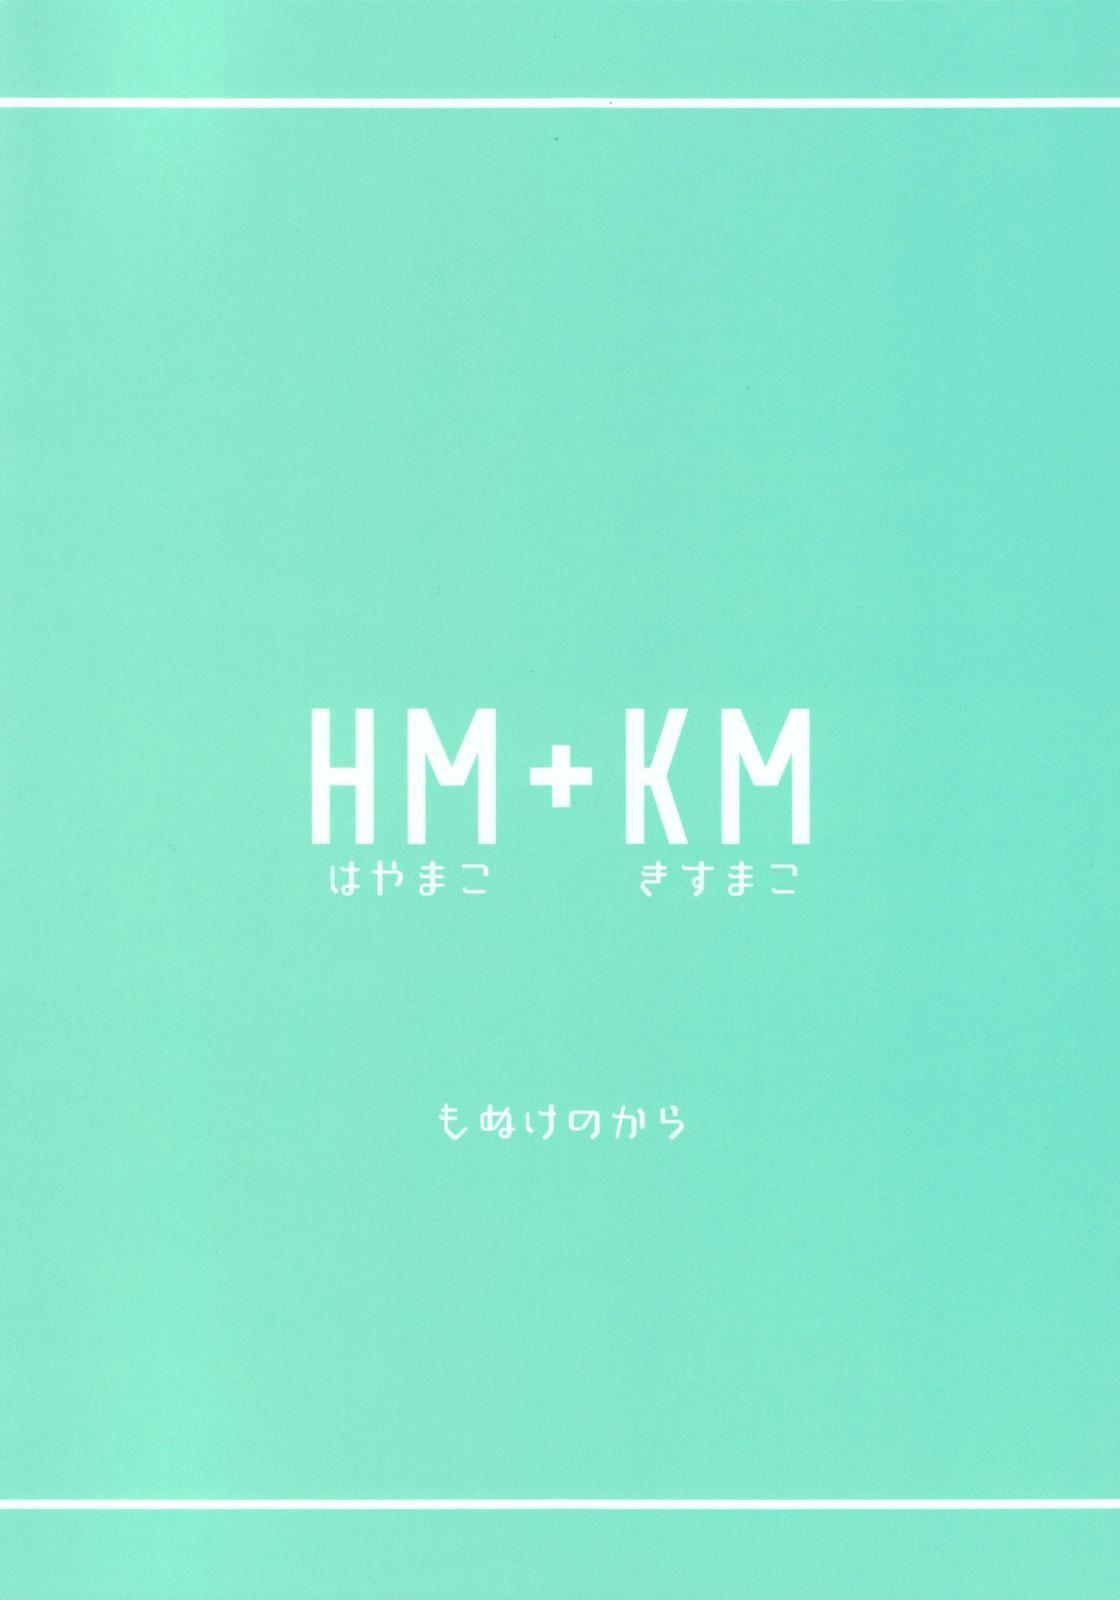 HM + KM 33